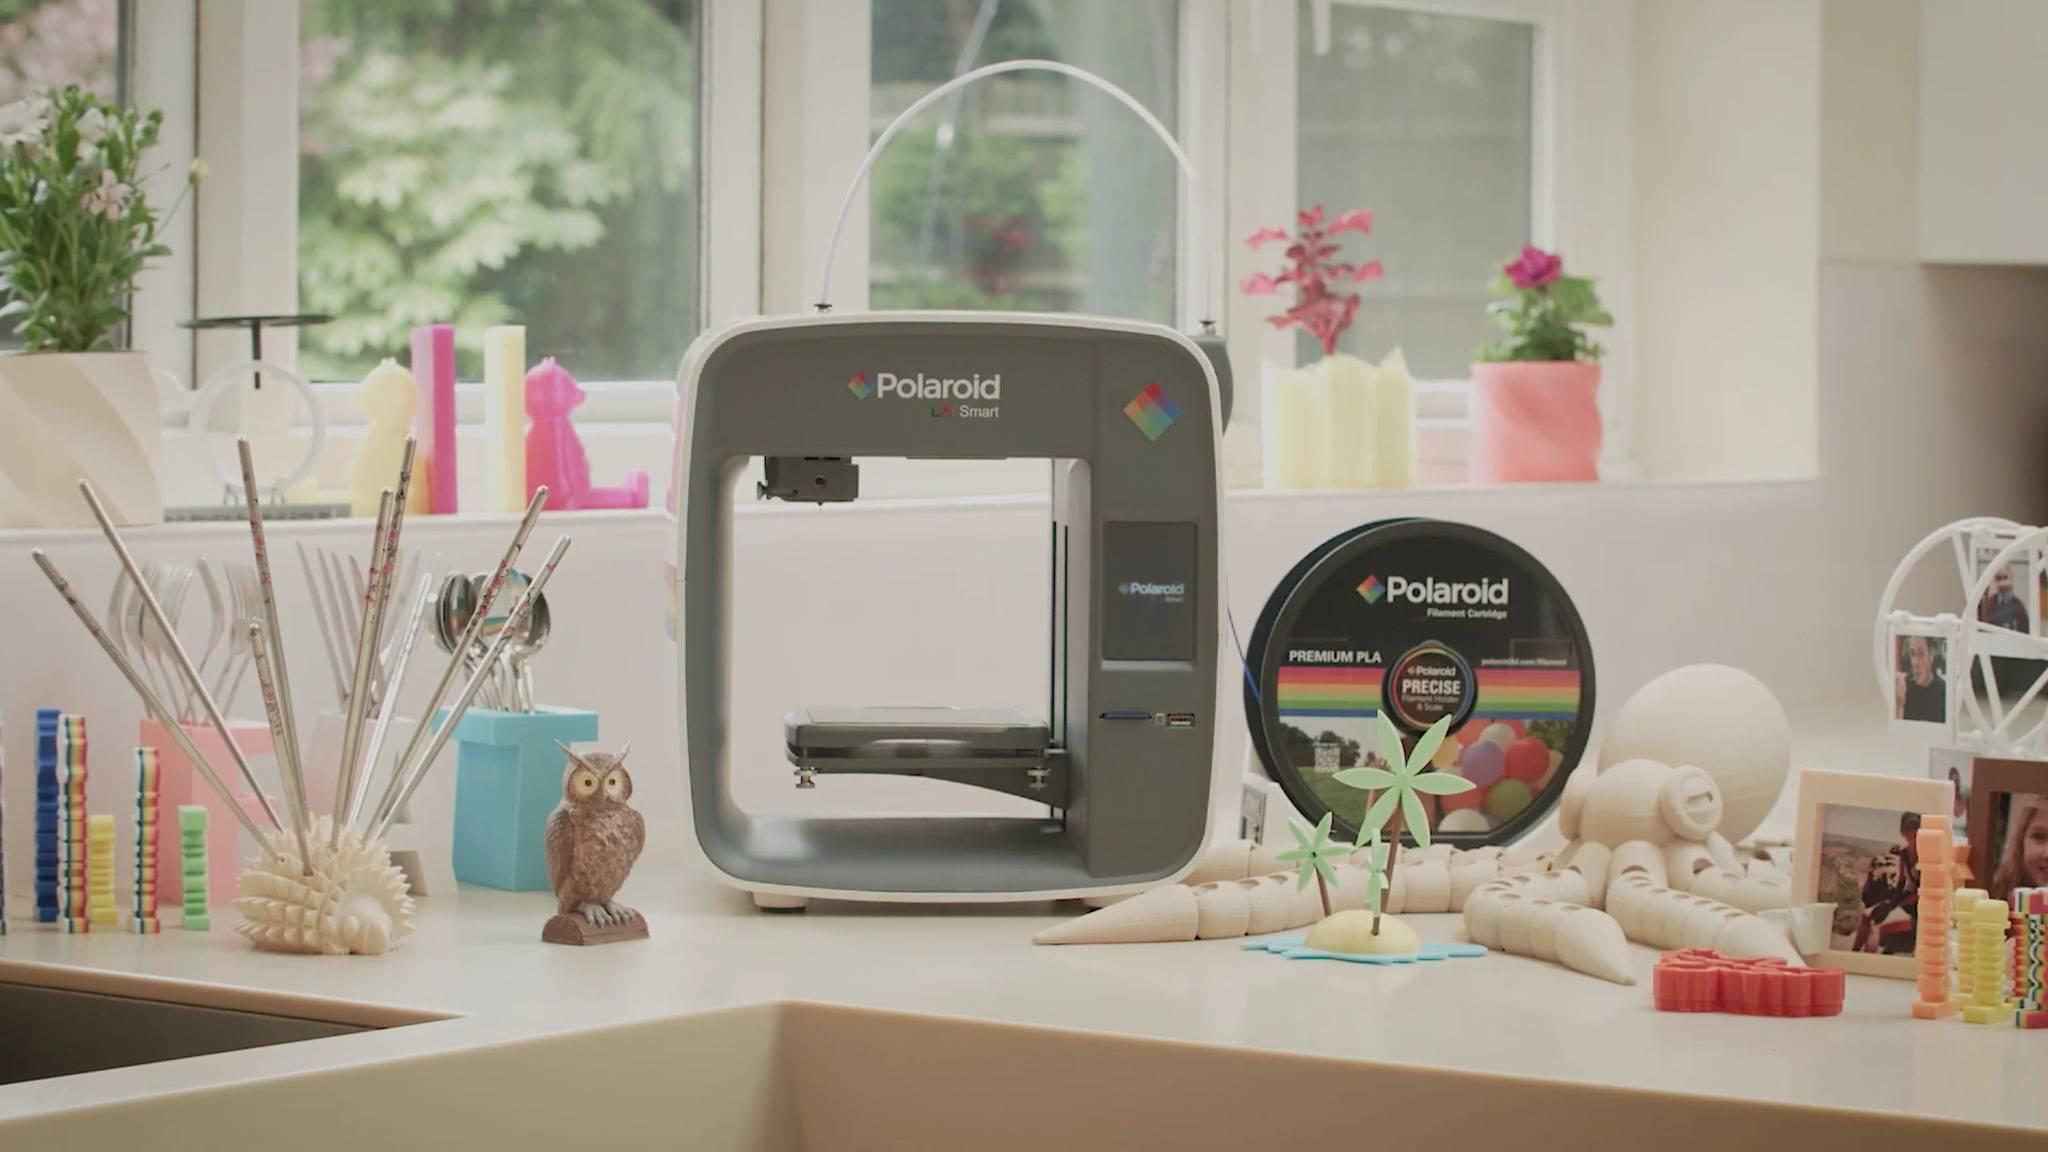 polaroid-playsmart-3d-drucker